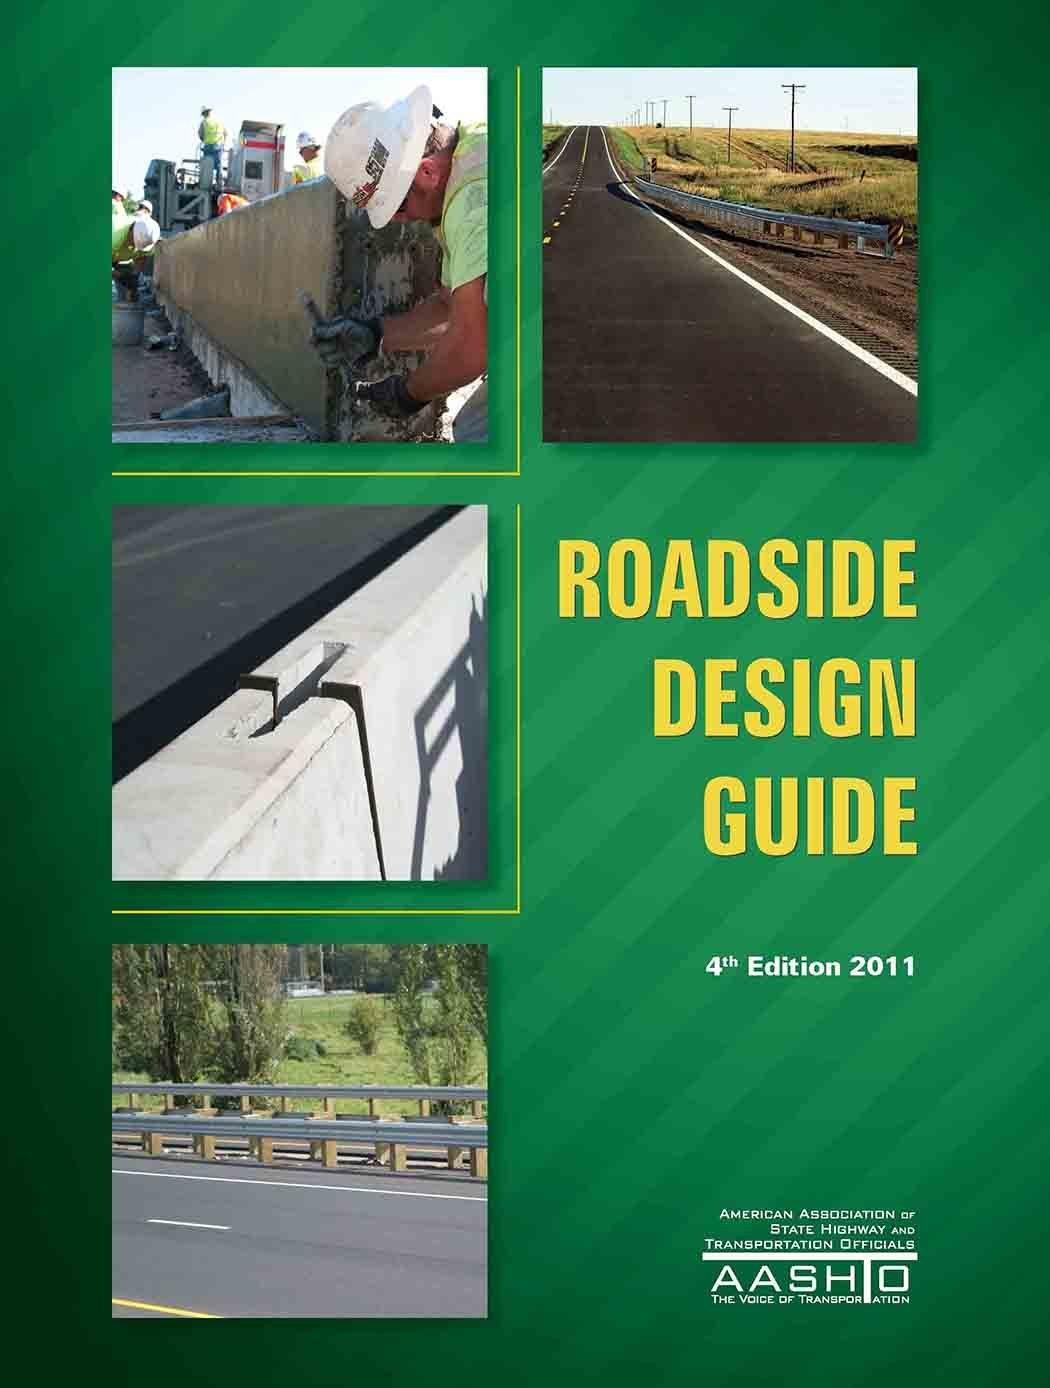 roadside design guide aashto 9781560515098 amazon com books rh amazon com aashto roadside design guidelines 2011 aashto roadside design guide 13